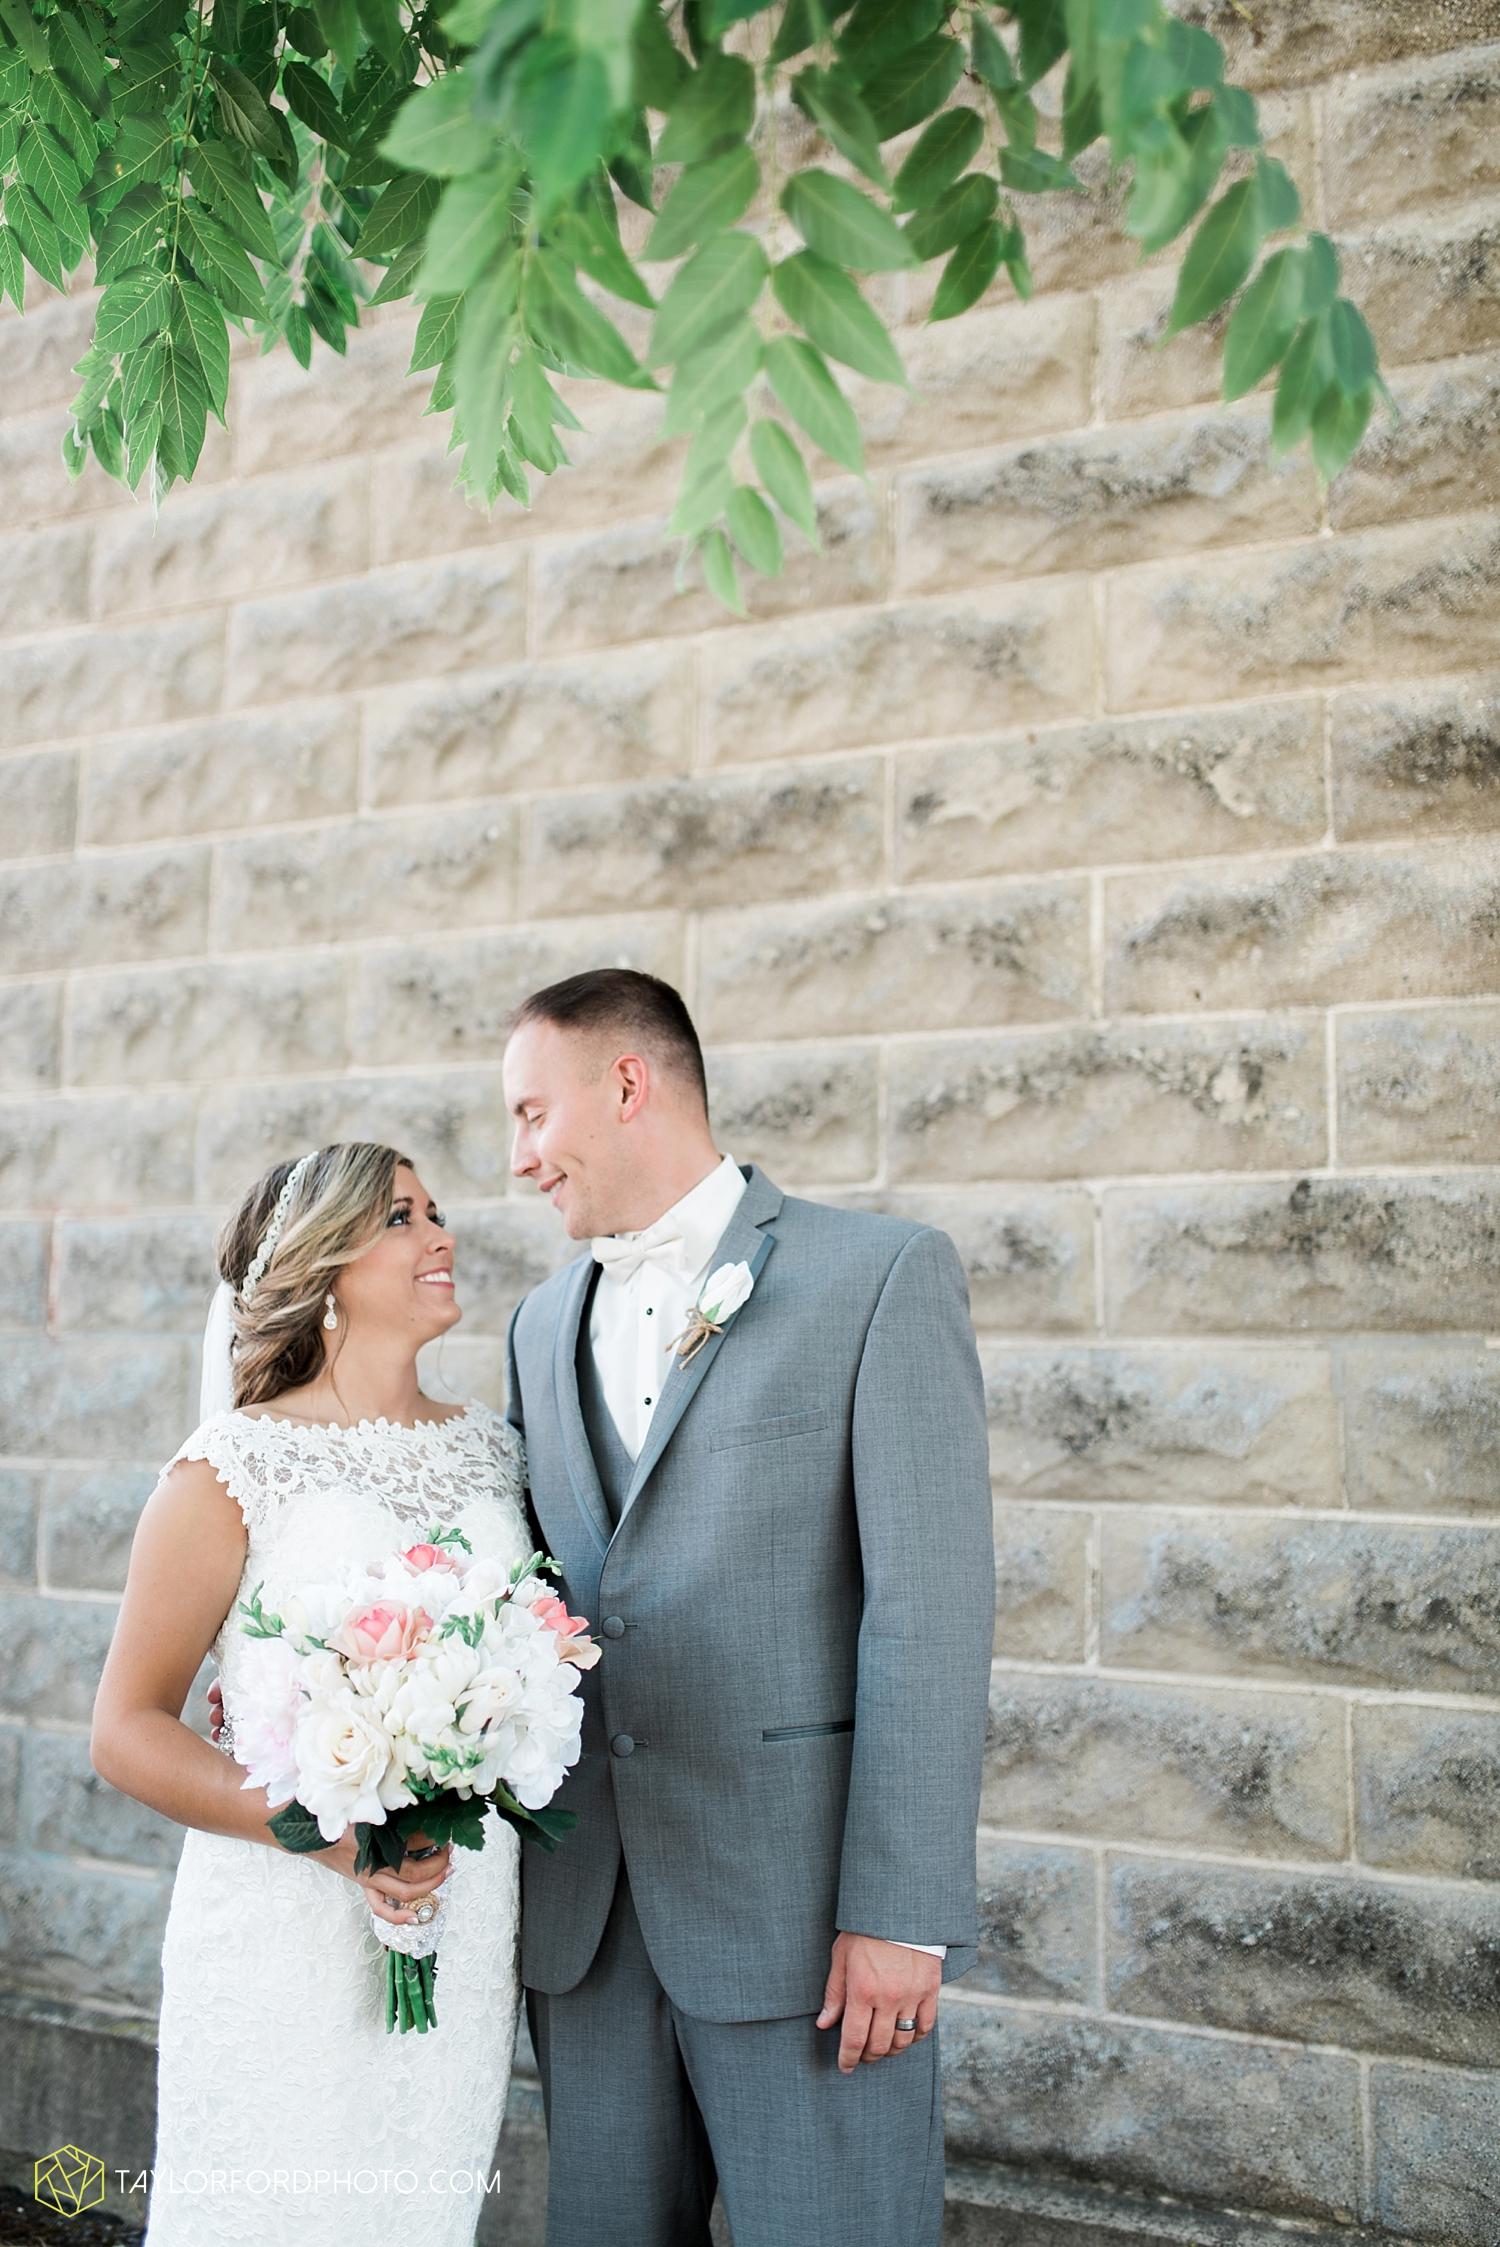 van_wert_wedding_photographer_taylor_ford_ohio_indiana_fort_wayne_2103.jpg